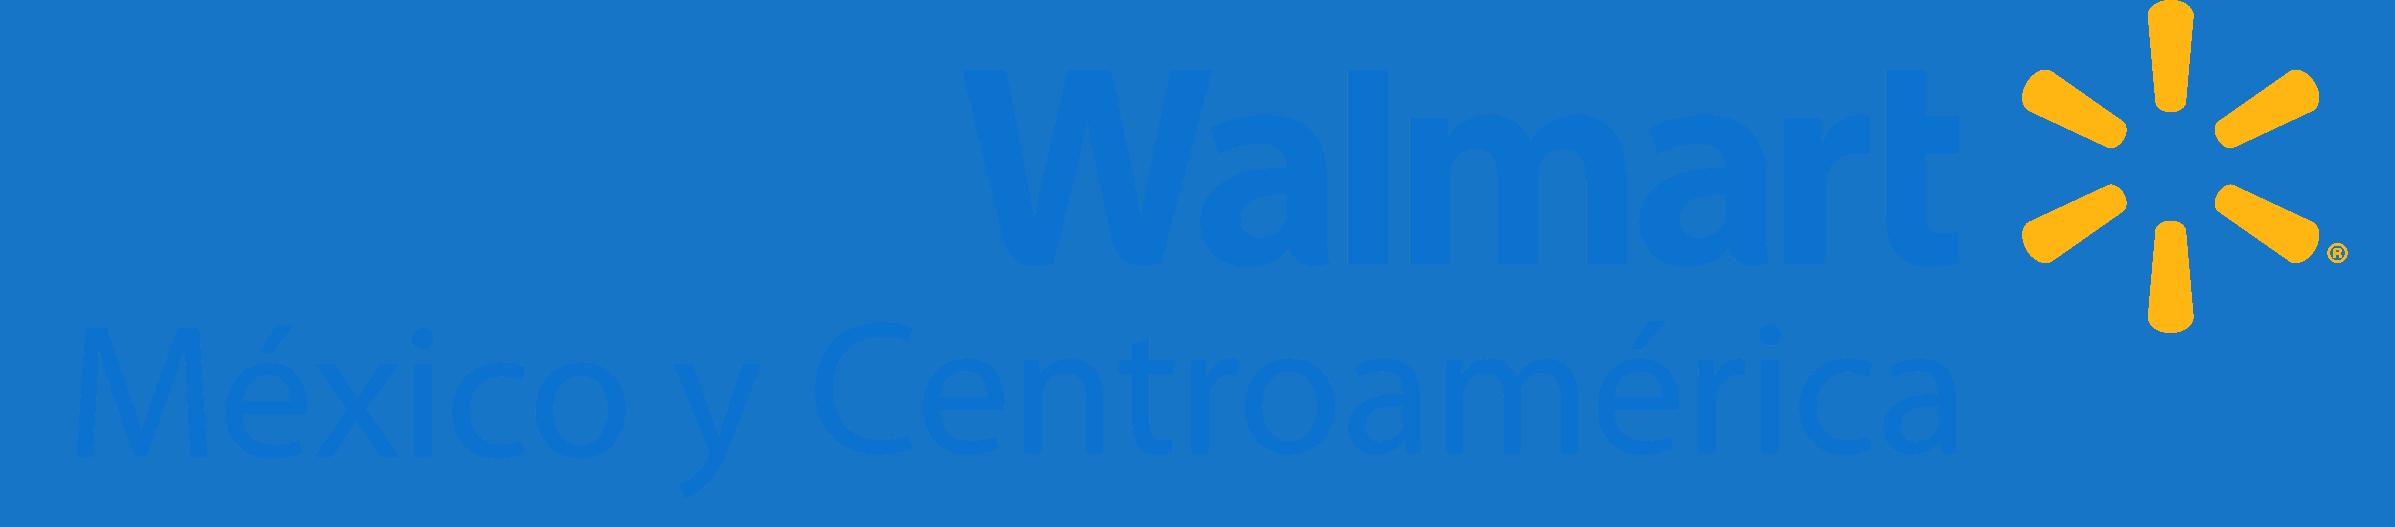 Walmart México y Centroamérica